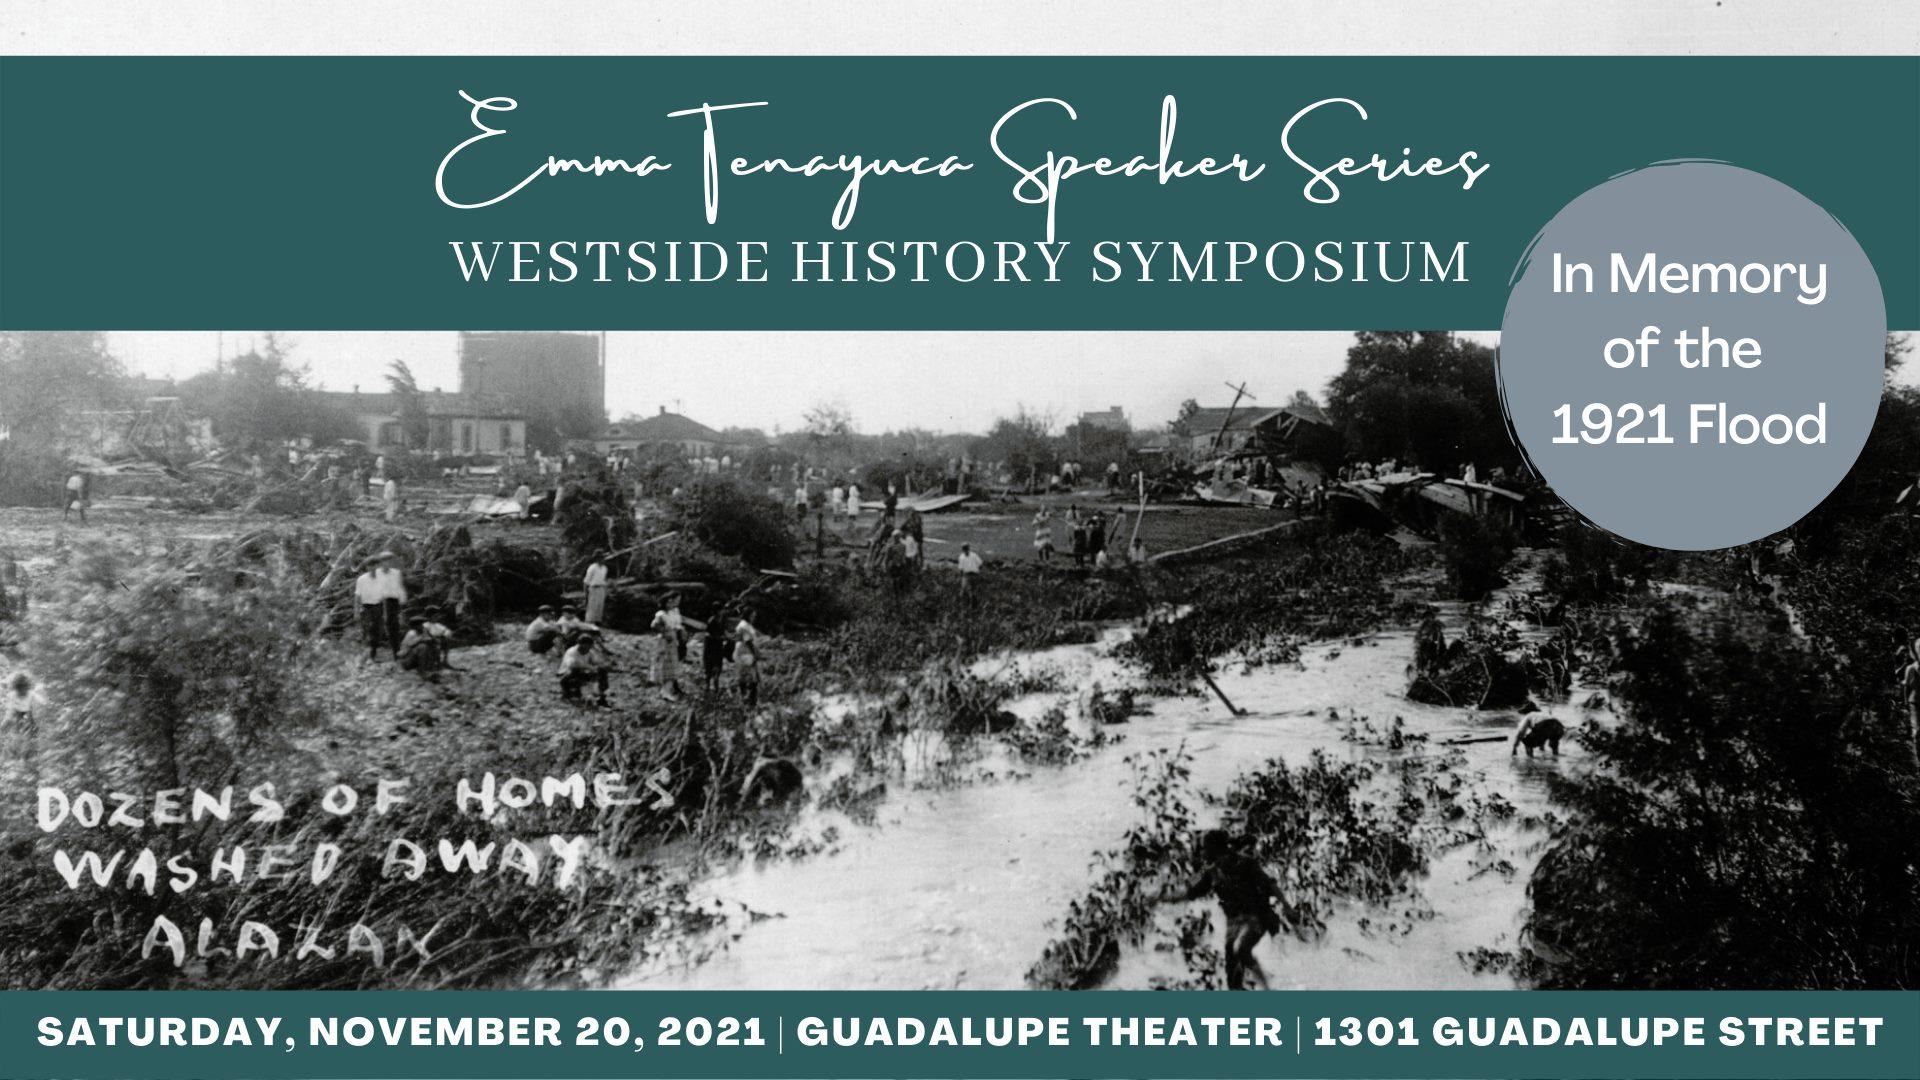 2021 Westside History Symposium: In Memory of the 1921 Flood